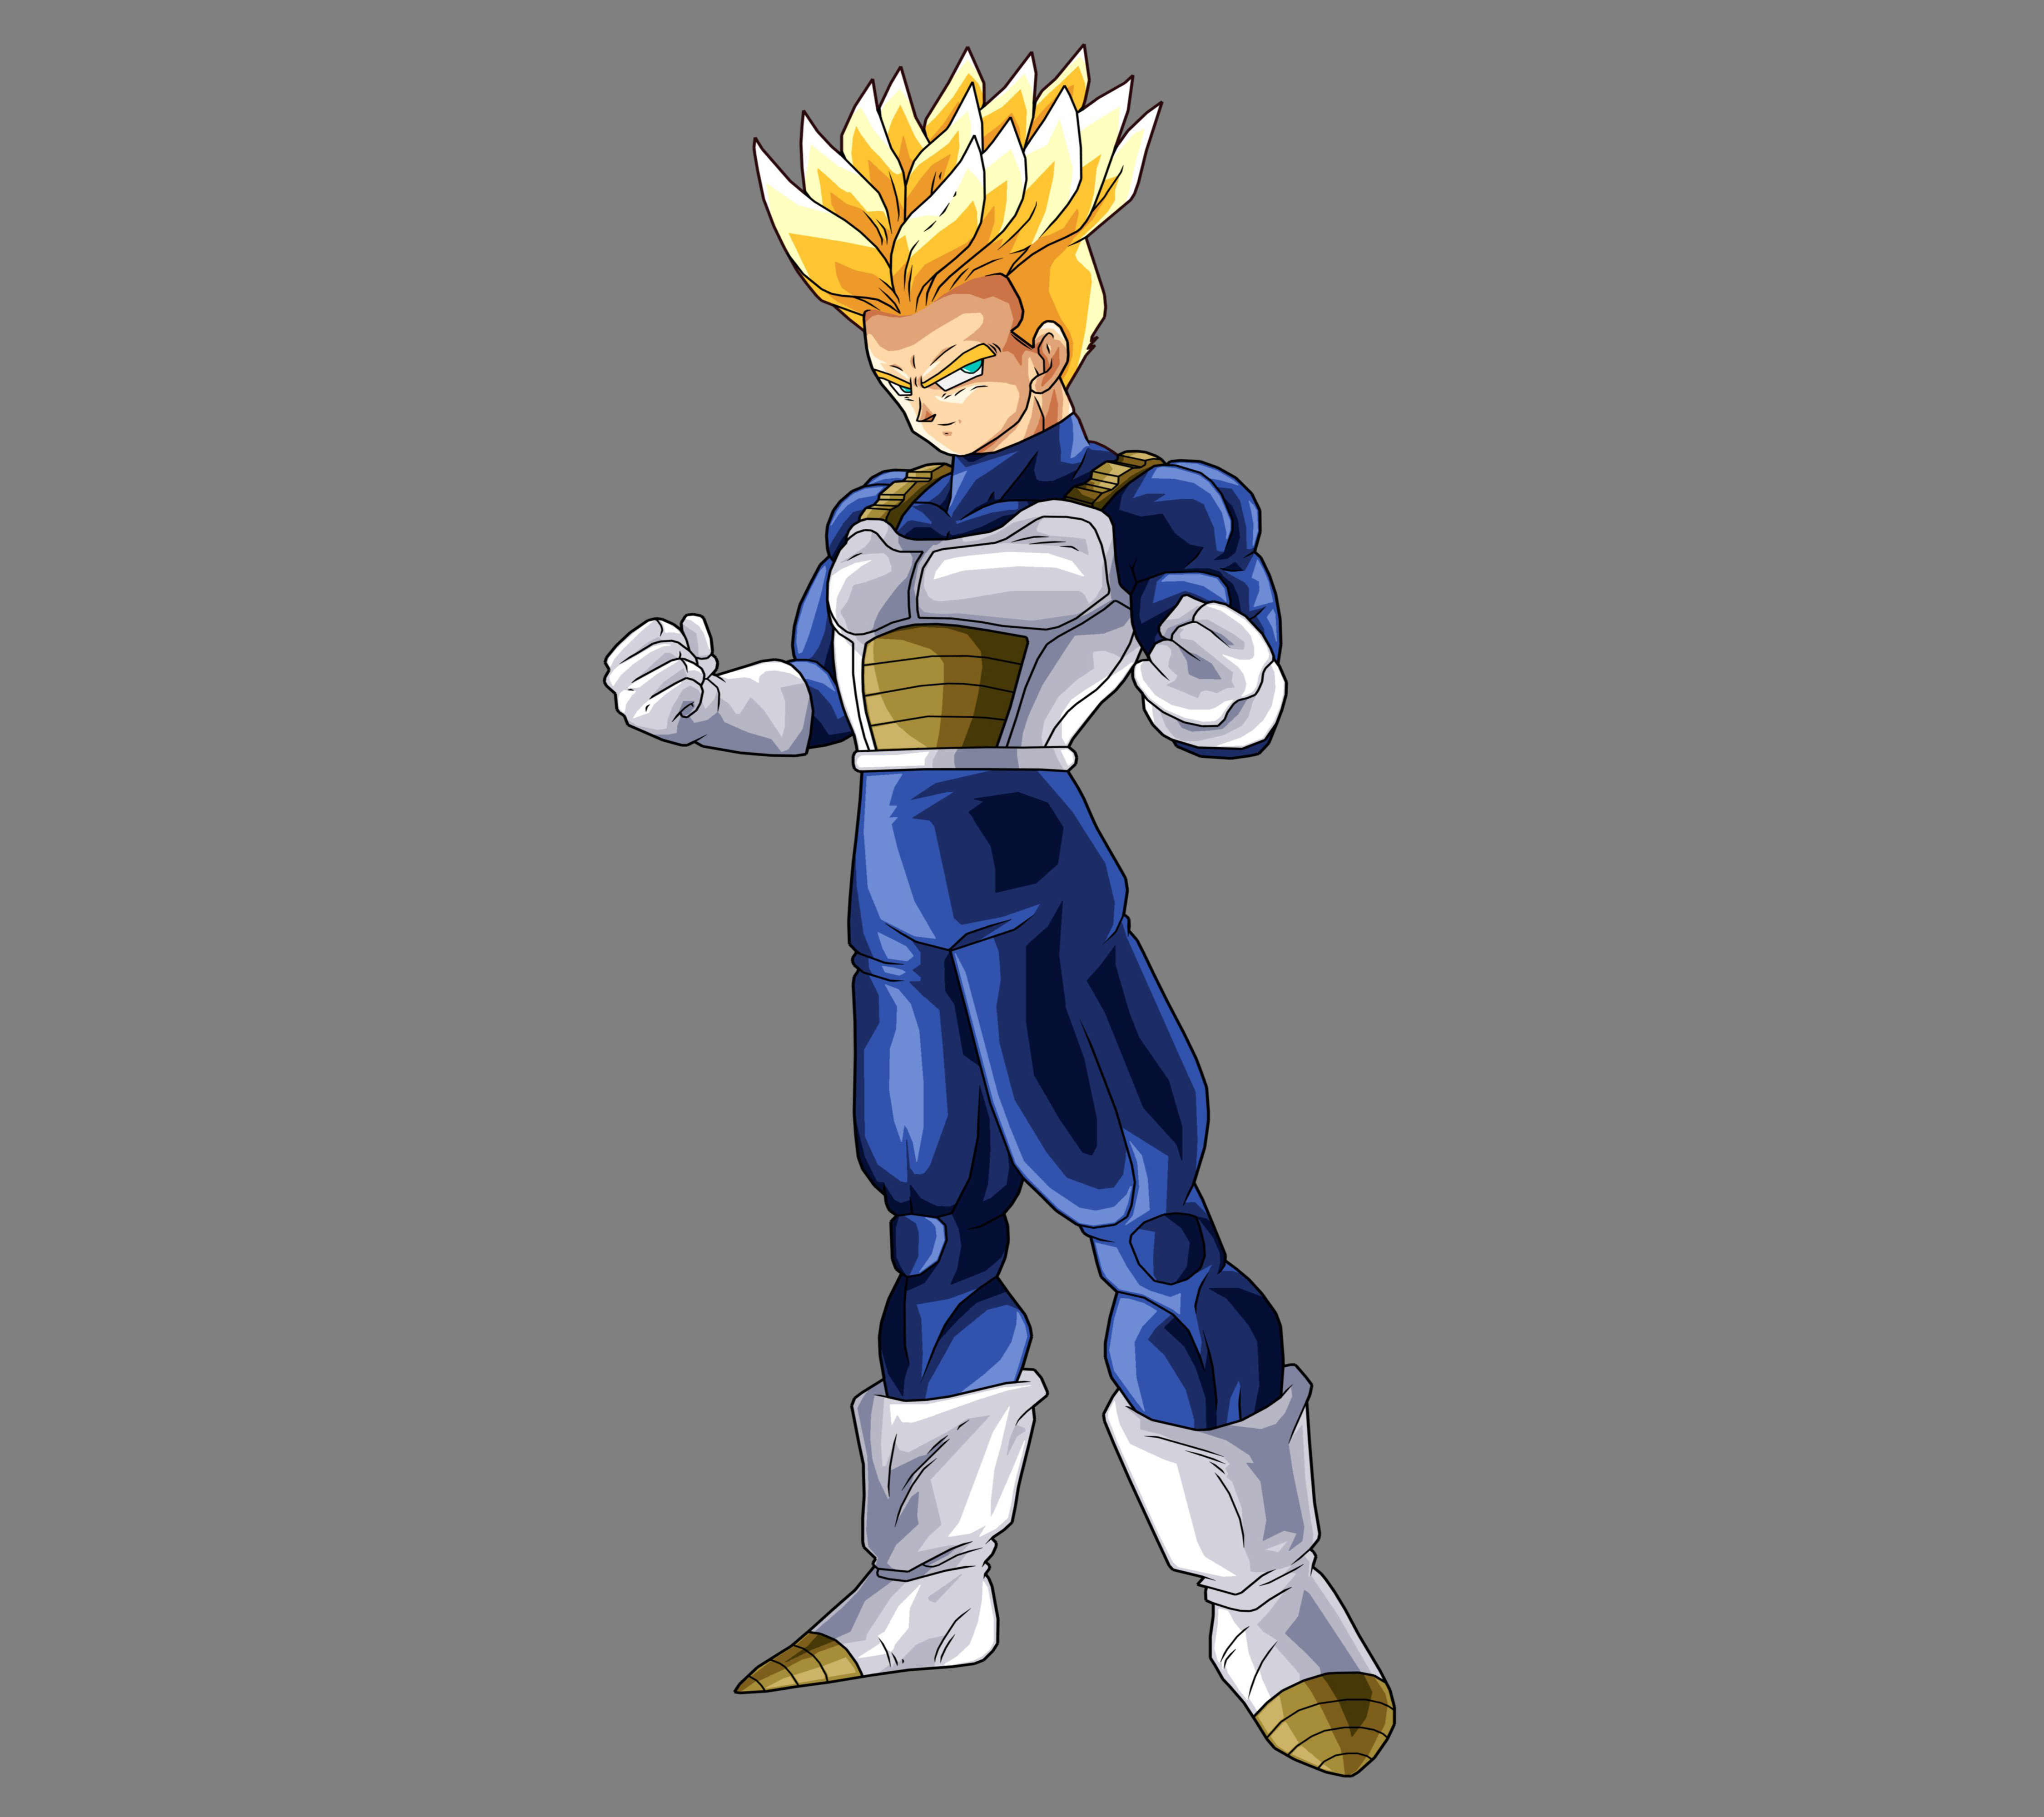 Goku Hd Wallpapers 1080p Trunk Ssj 4k Ultra Hd Fond D 233 Cran And Arri 232 Re Plan